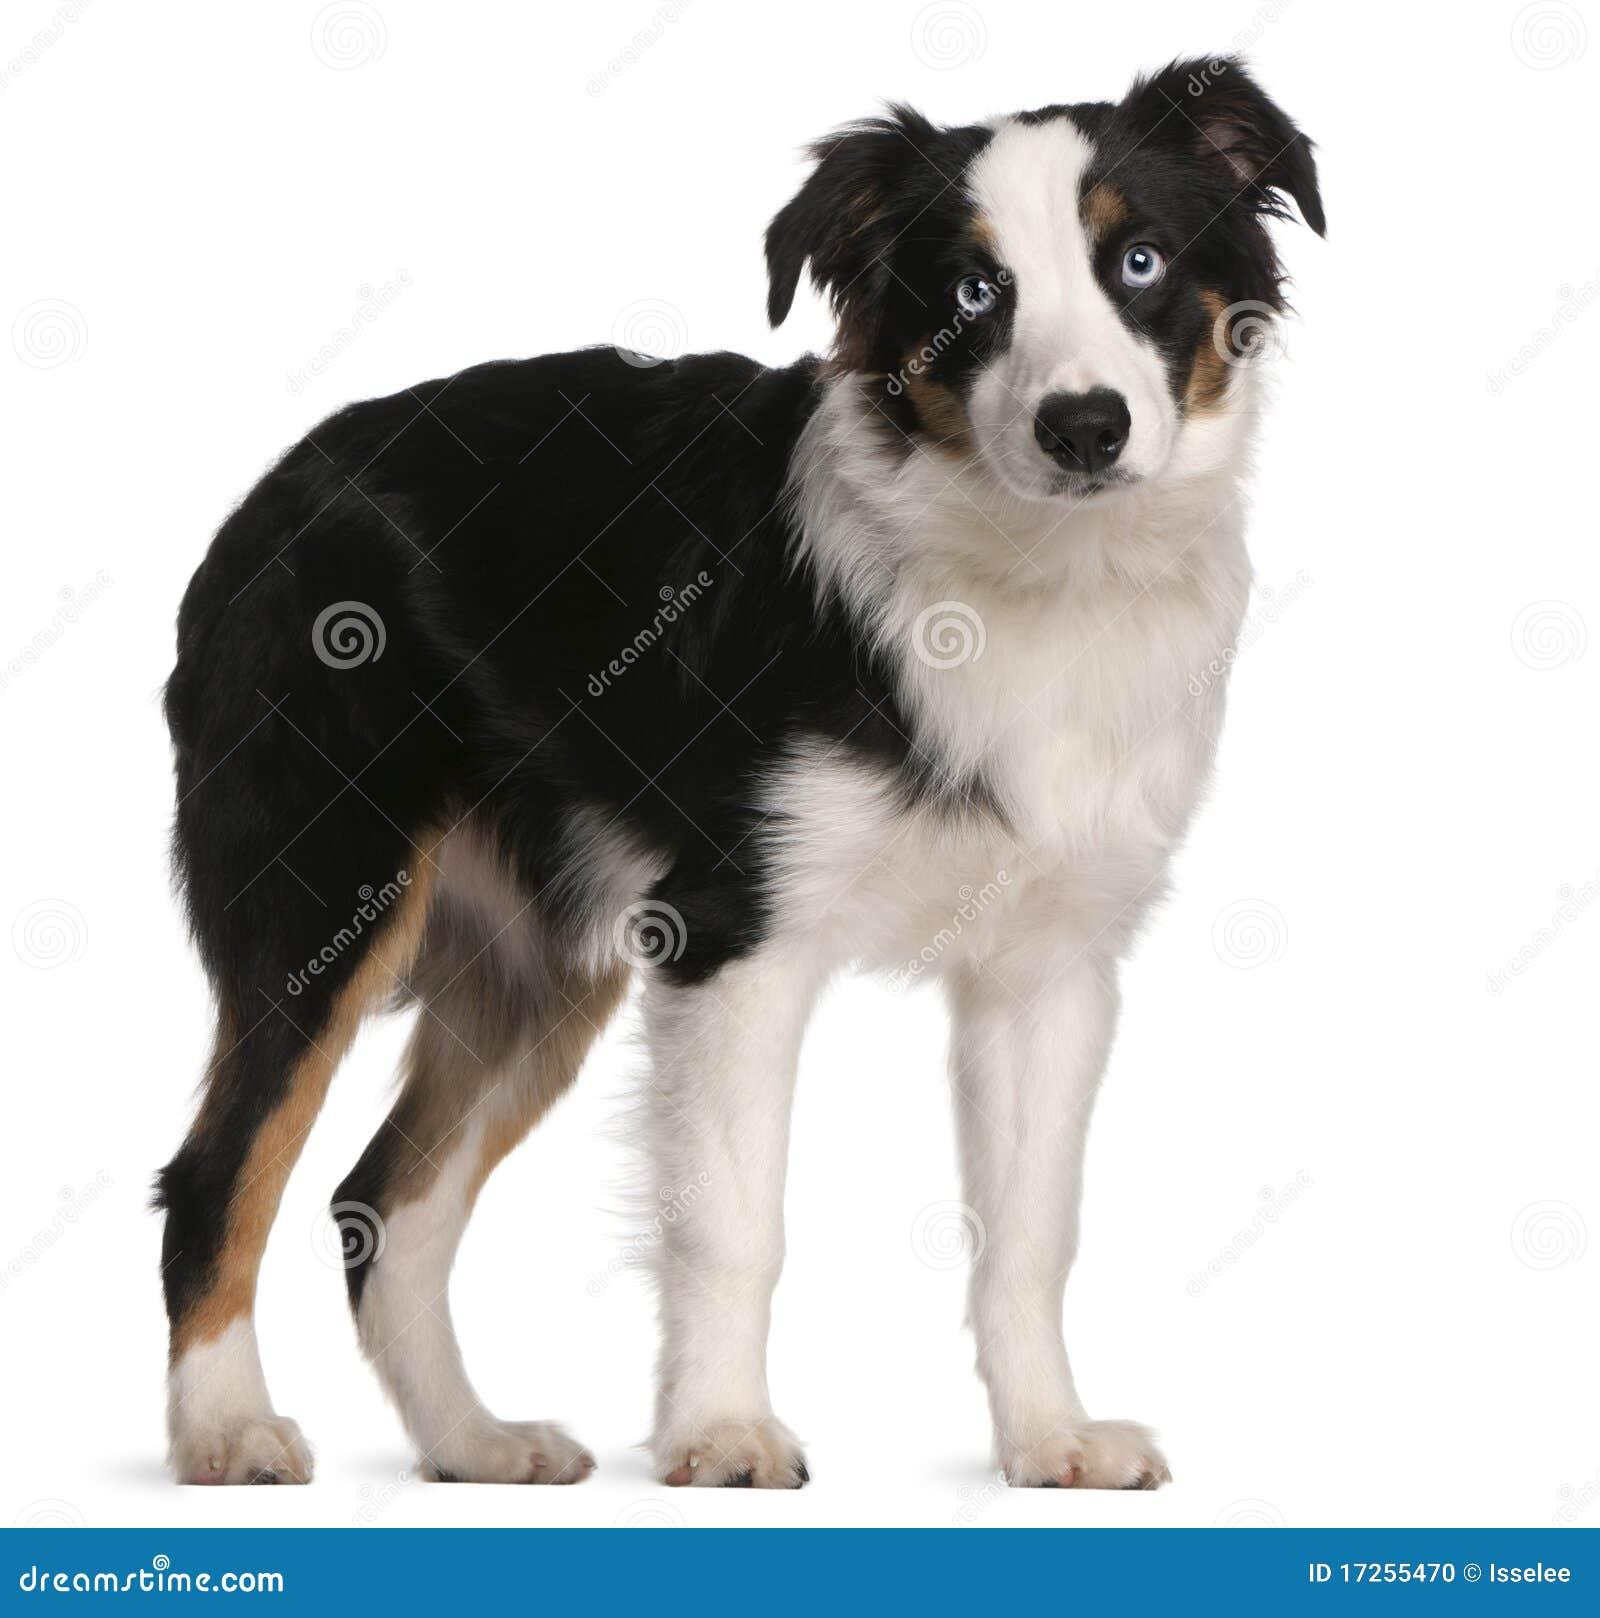 Australian Shepherd Puppy, 5 Months Old Stock Photo - Image: 17255470